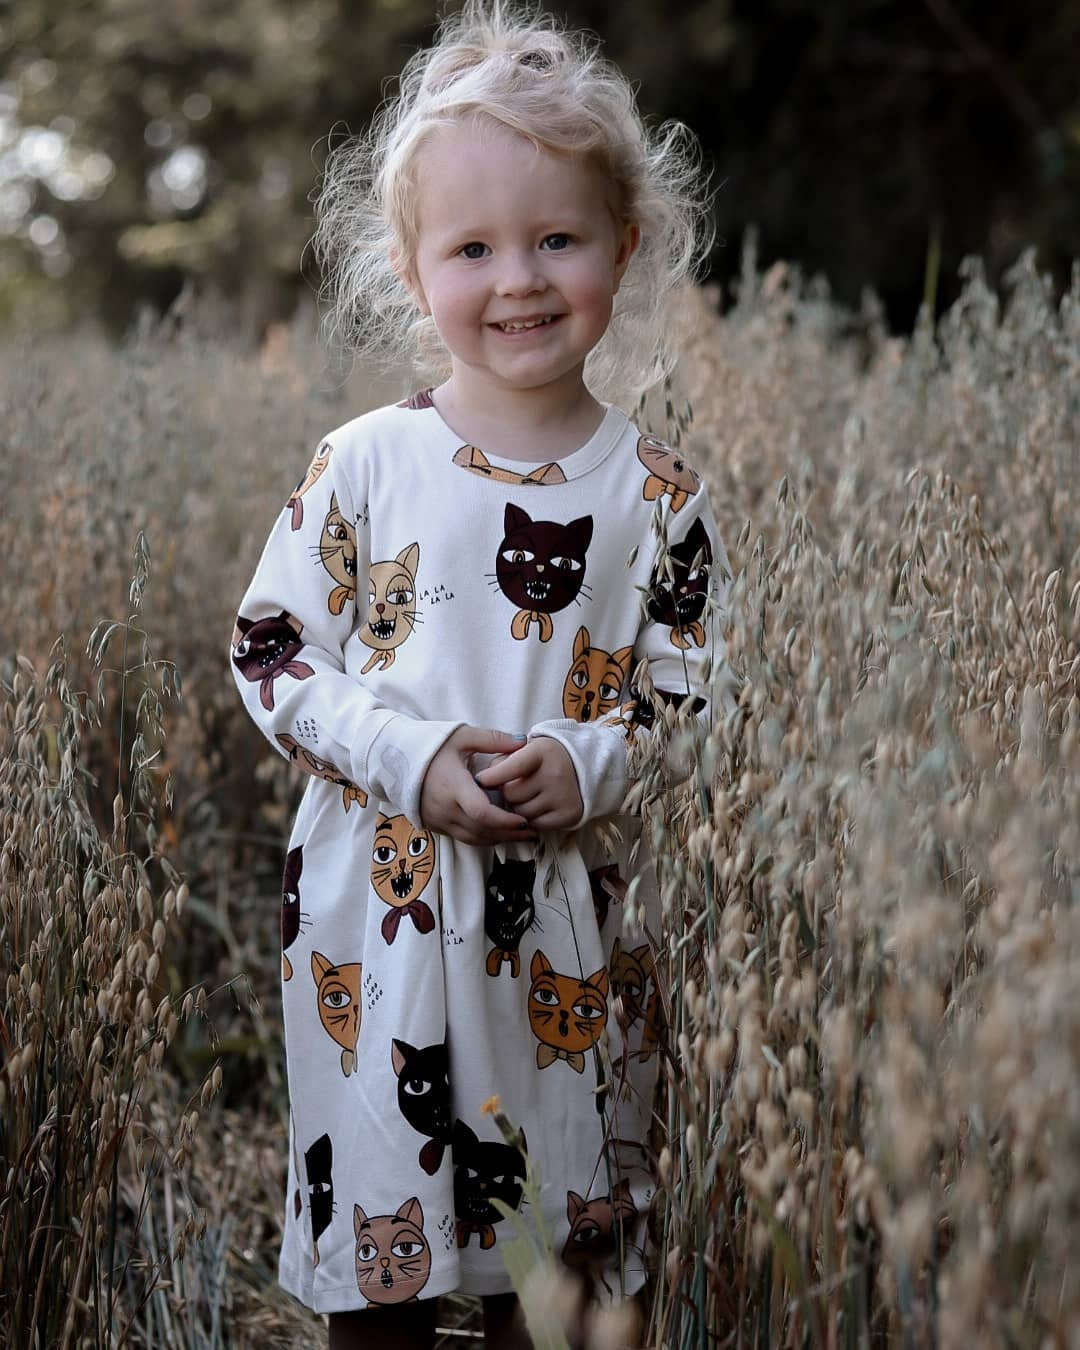 MINI Brand Kids T-shirts 2020 New Autumn Girls Heart Pattern Dress Fall Long Sleeve Cotton Fashion Baby Girl Boys Casual Dresses 4